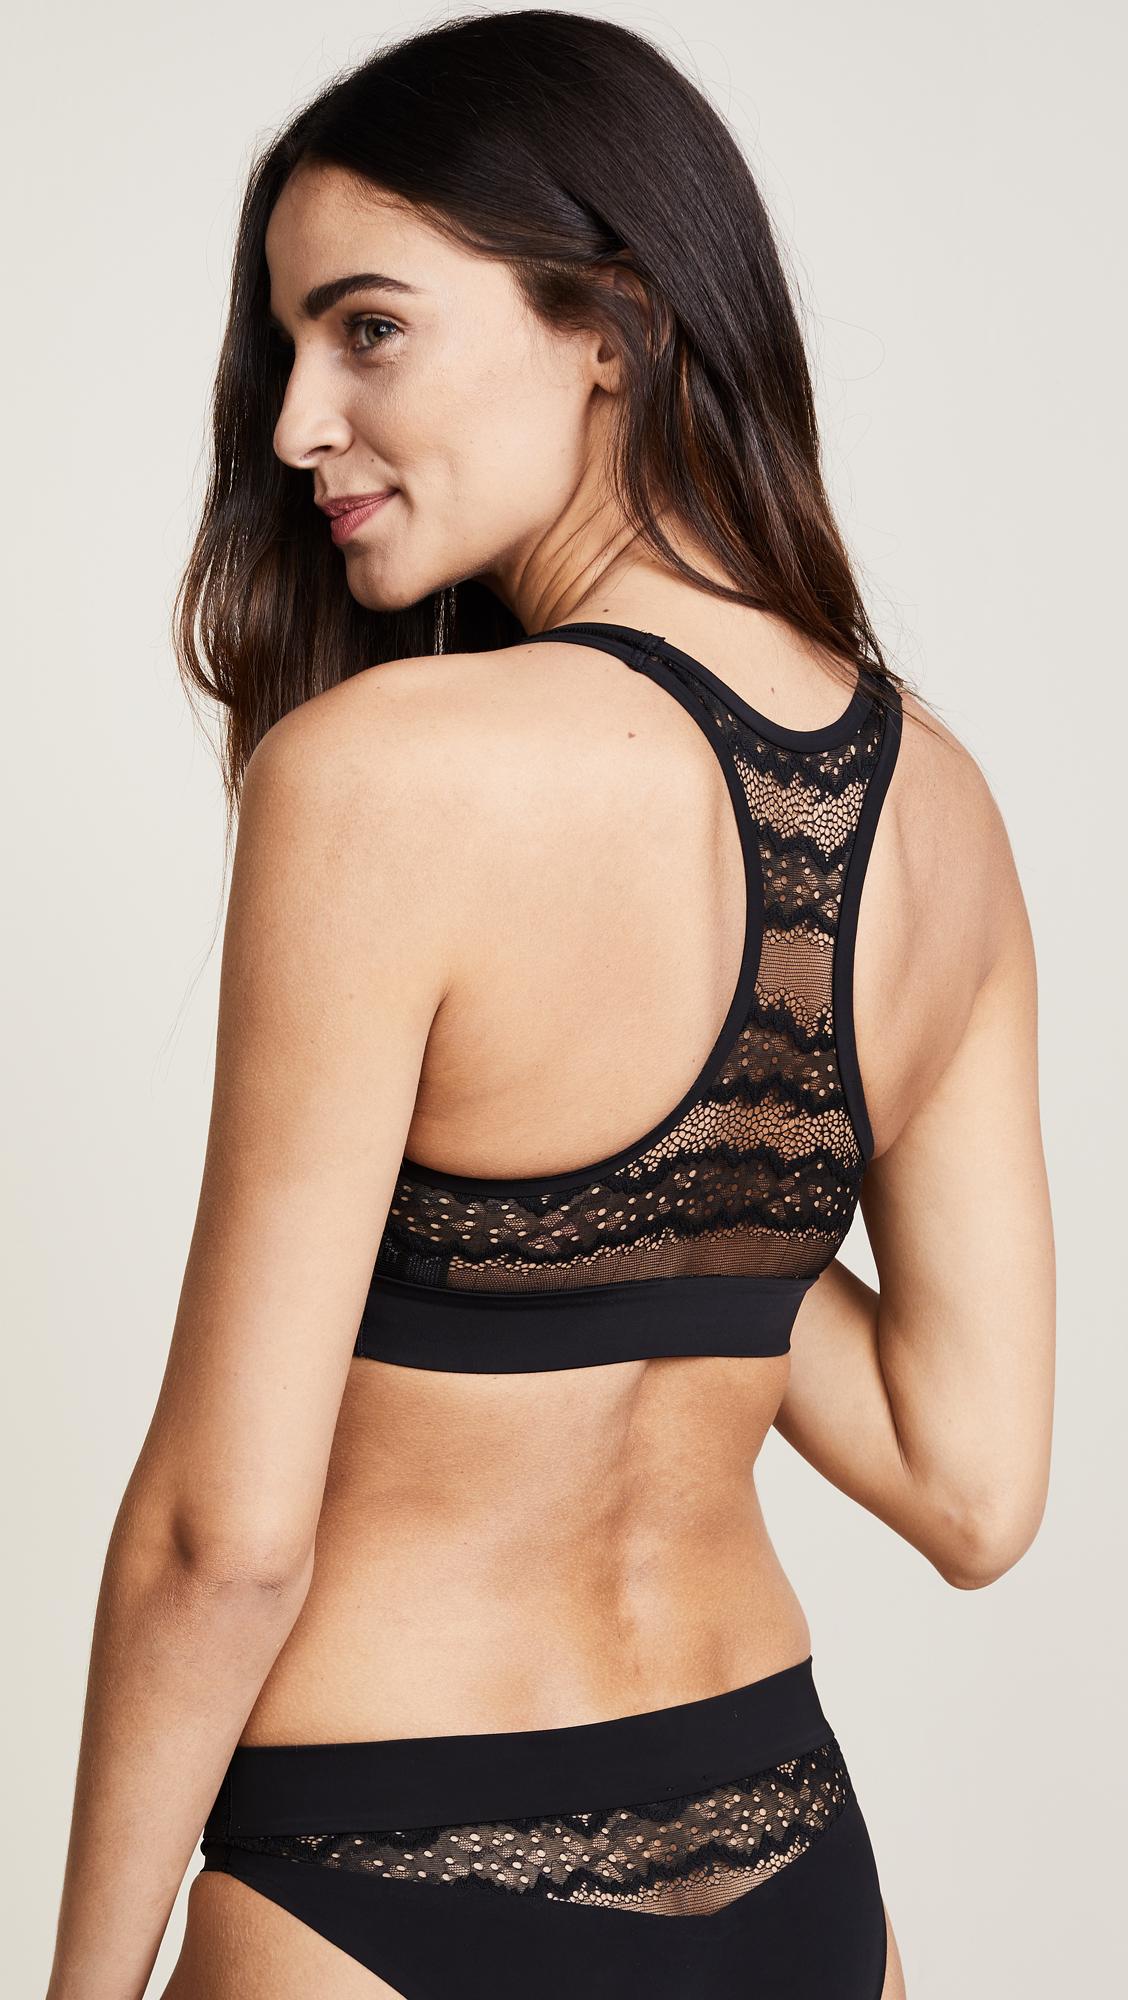 d5a29bd78915c Calvin Klein Underwear CK Black Electric Unlined Bralette